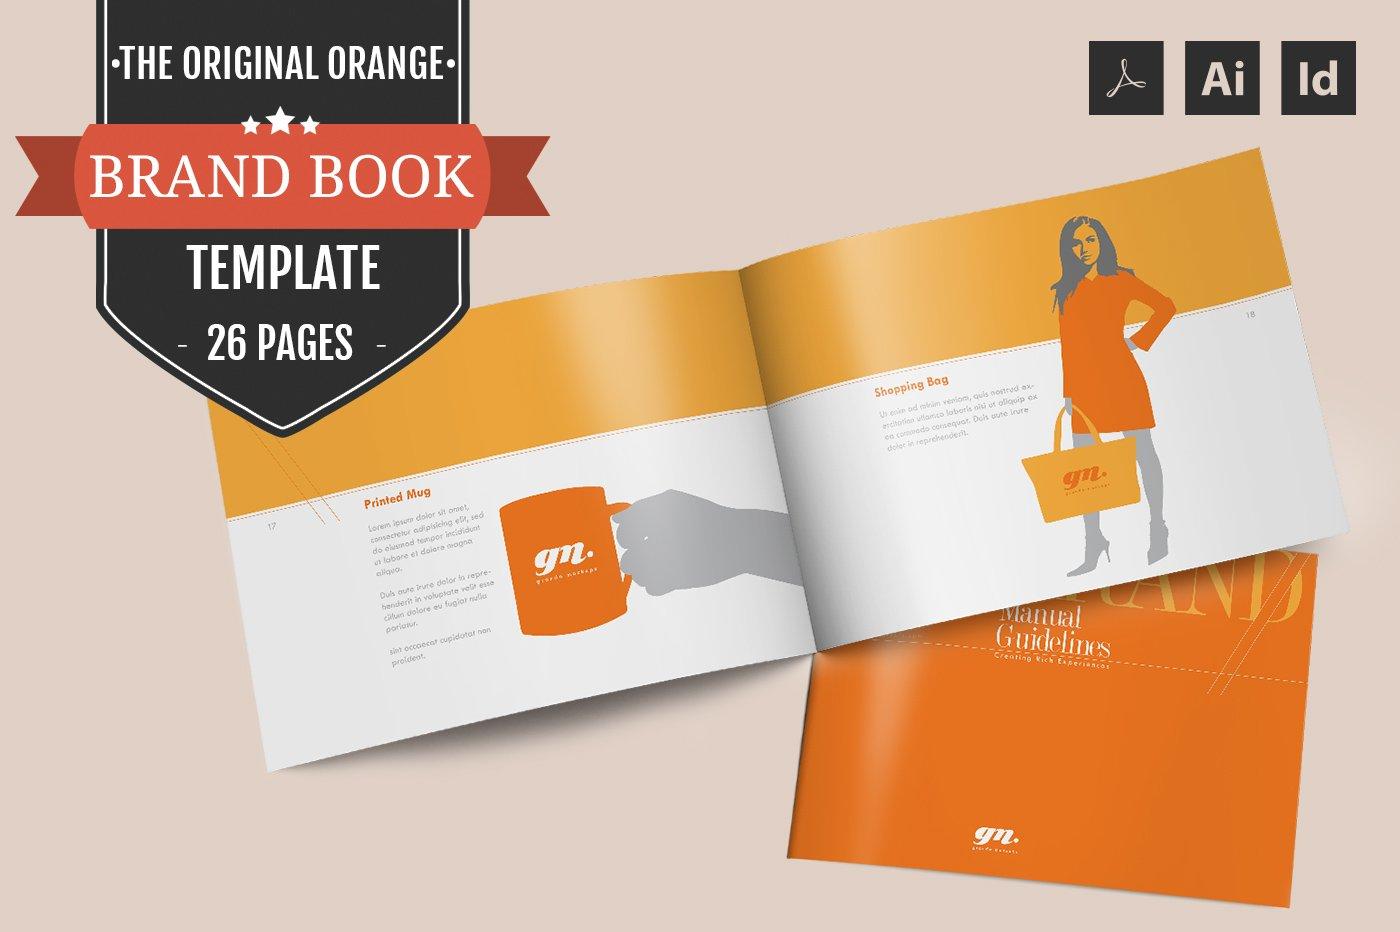 the original orange brand book